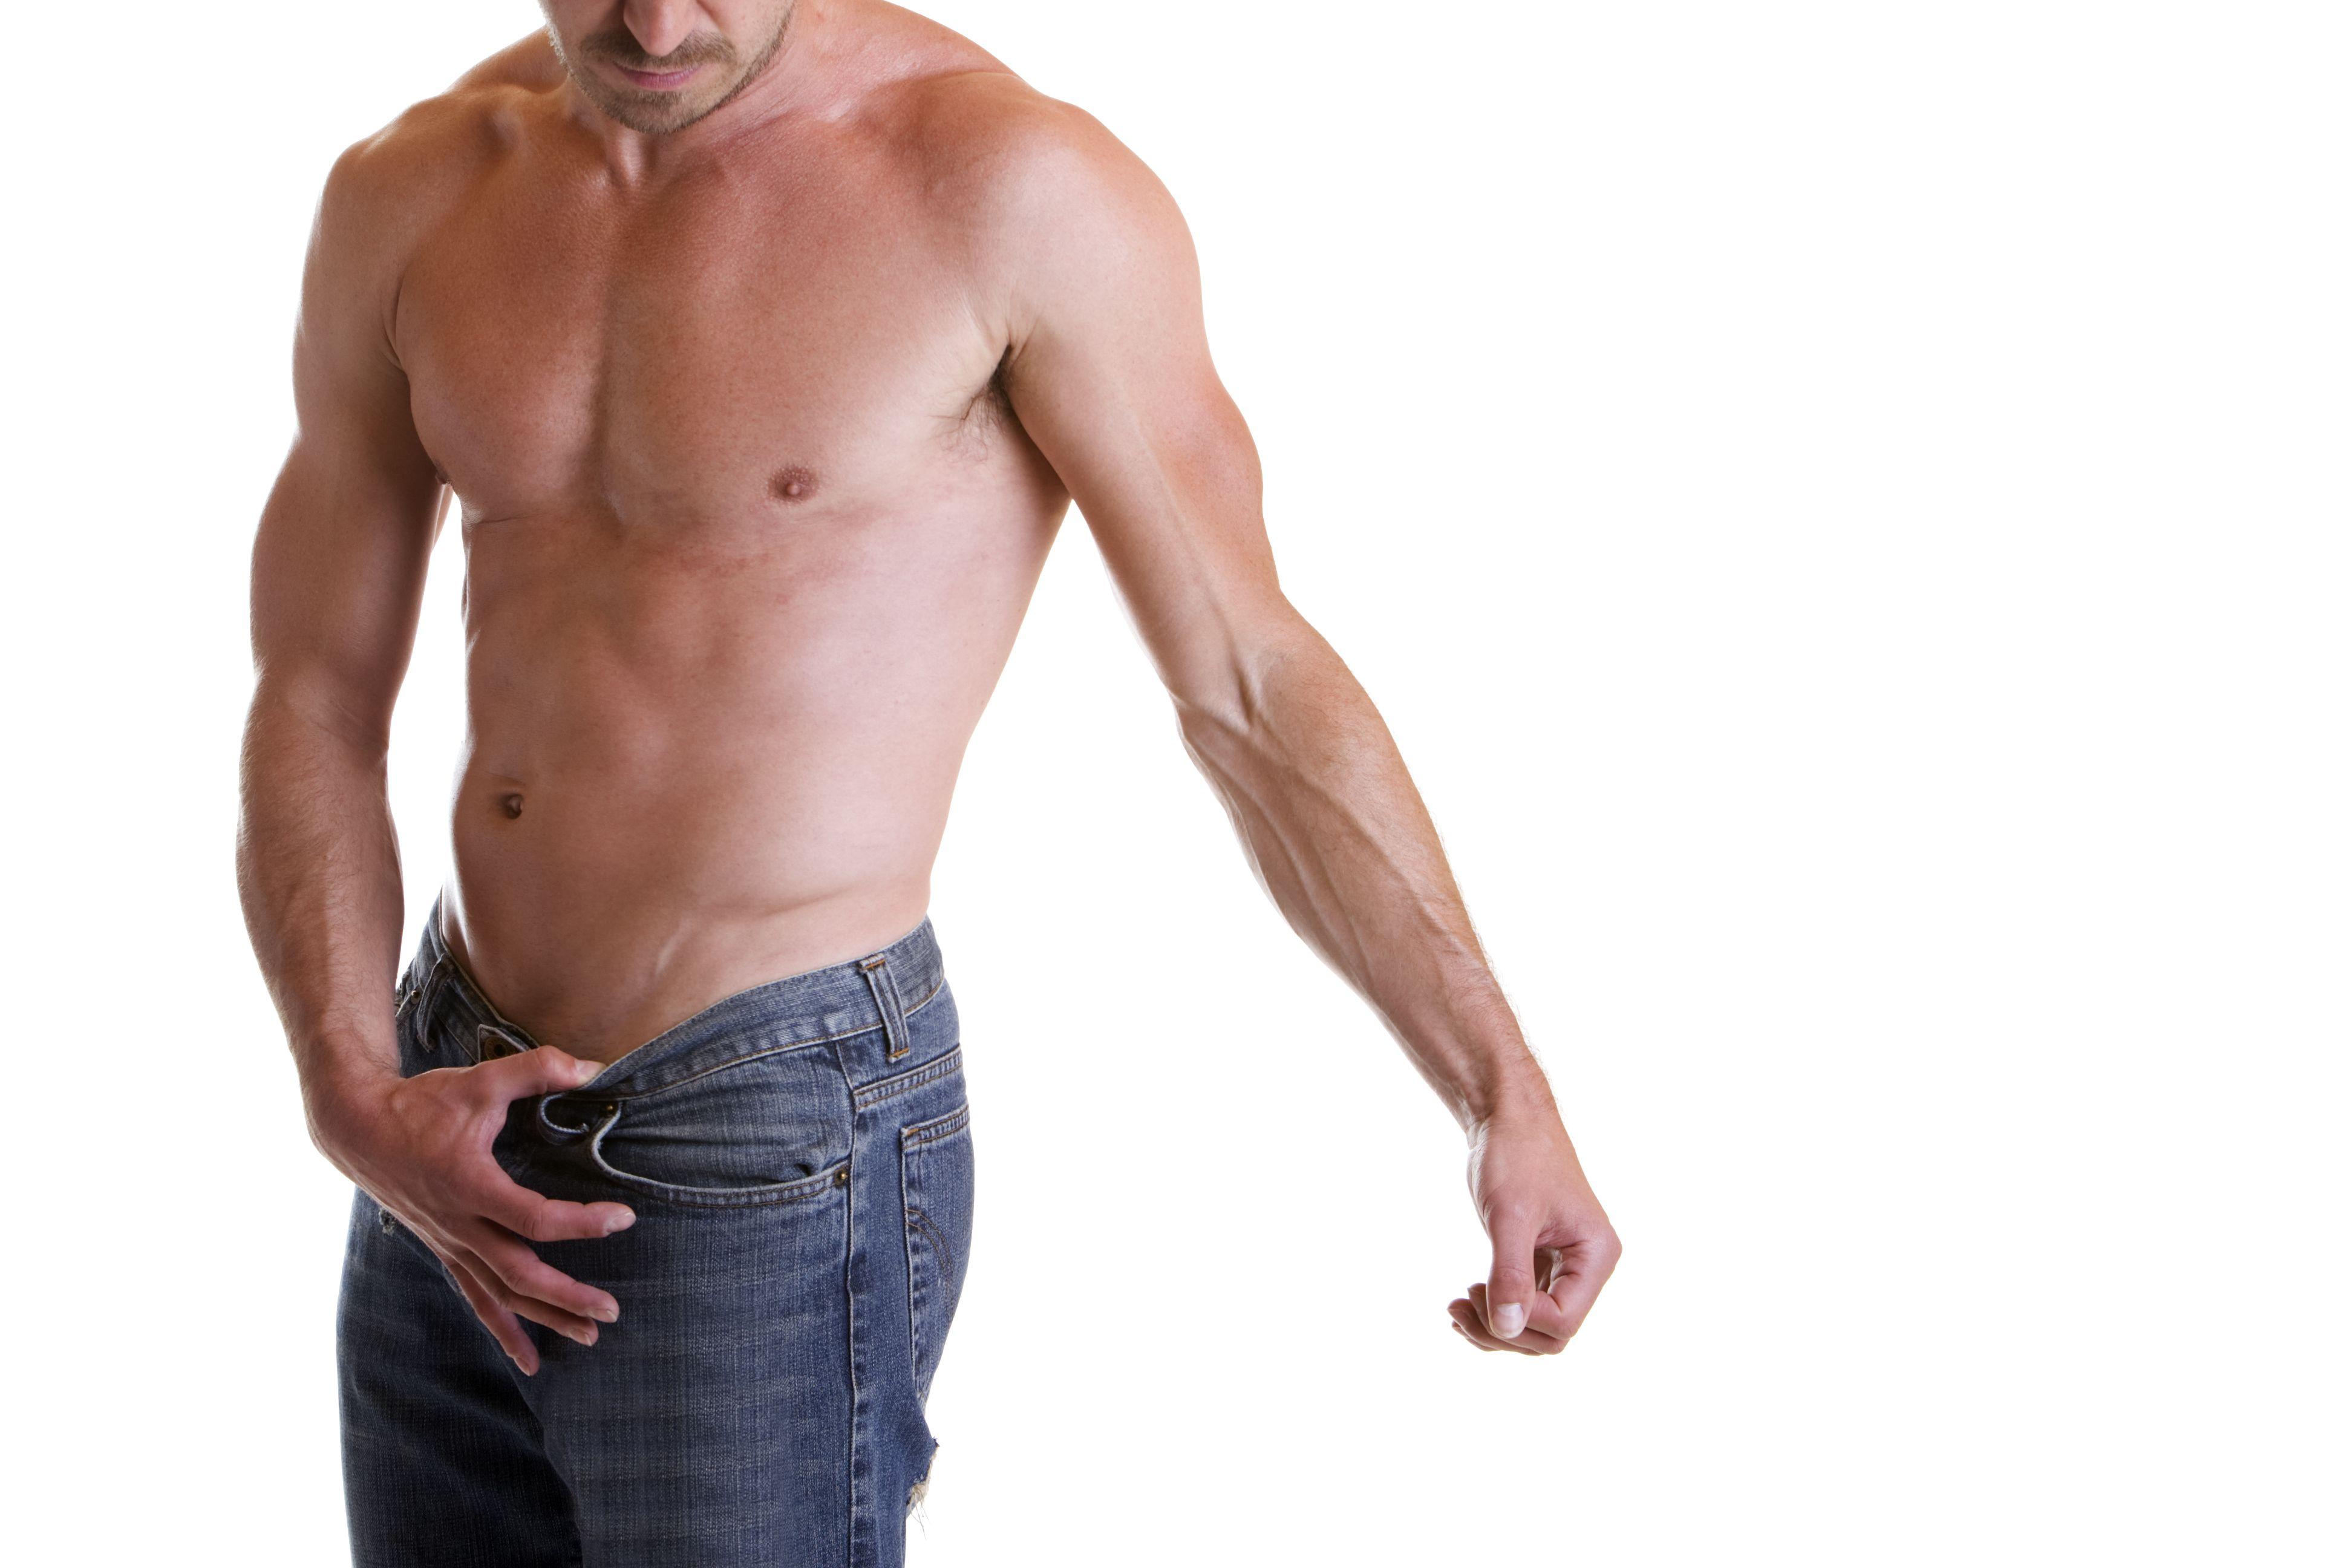 Male enhancement pills that work fast ireland